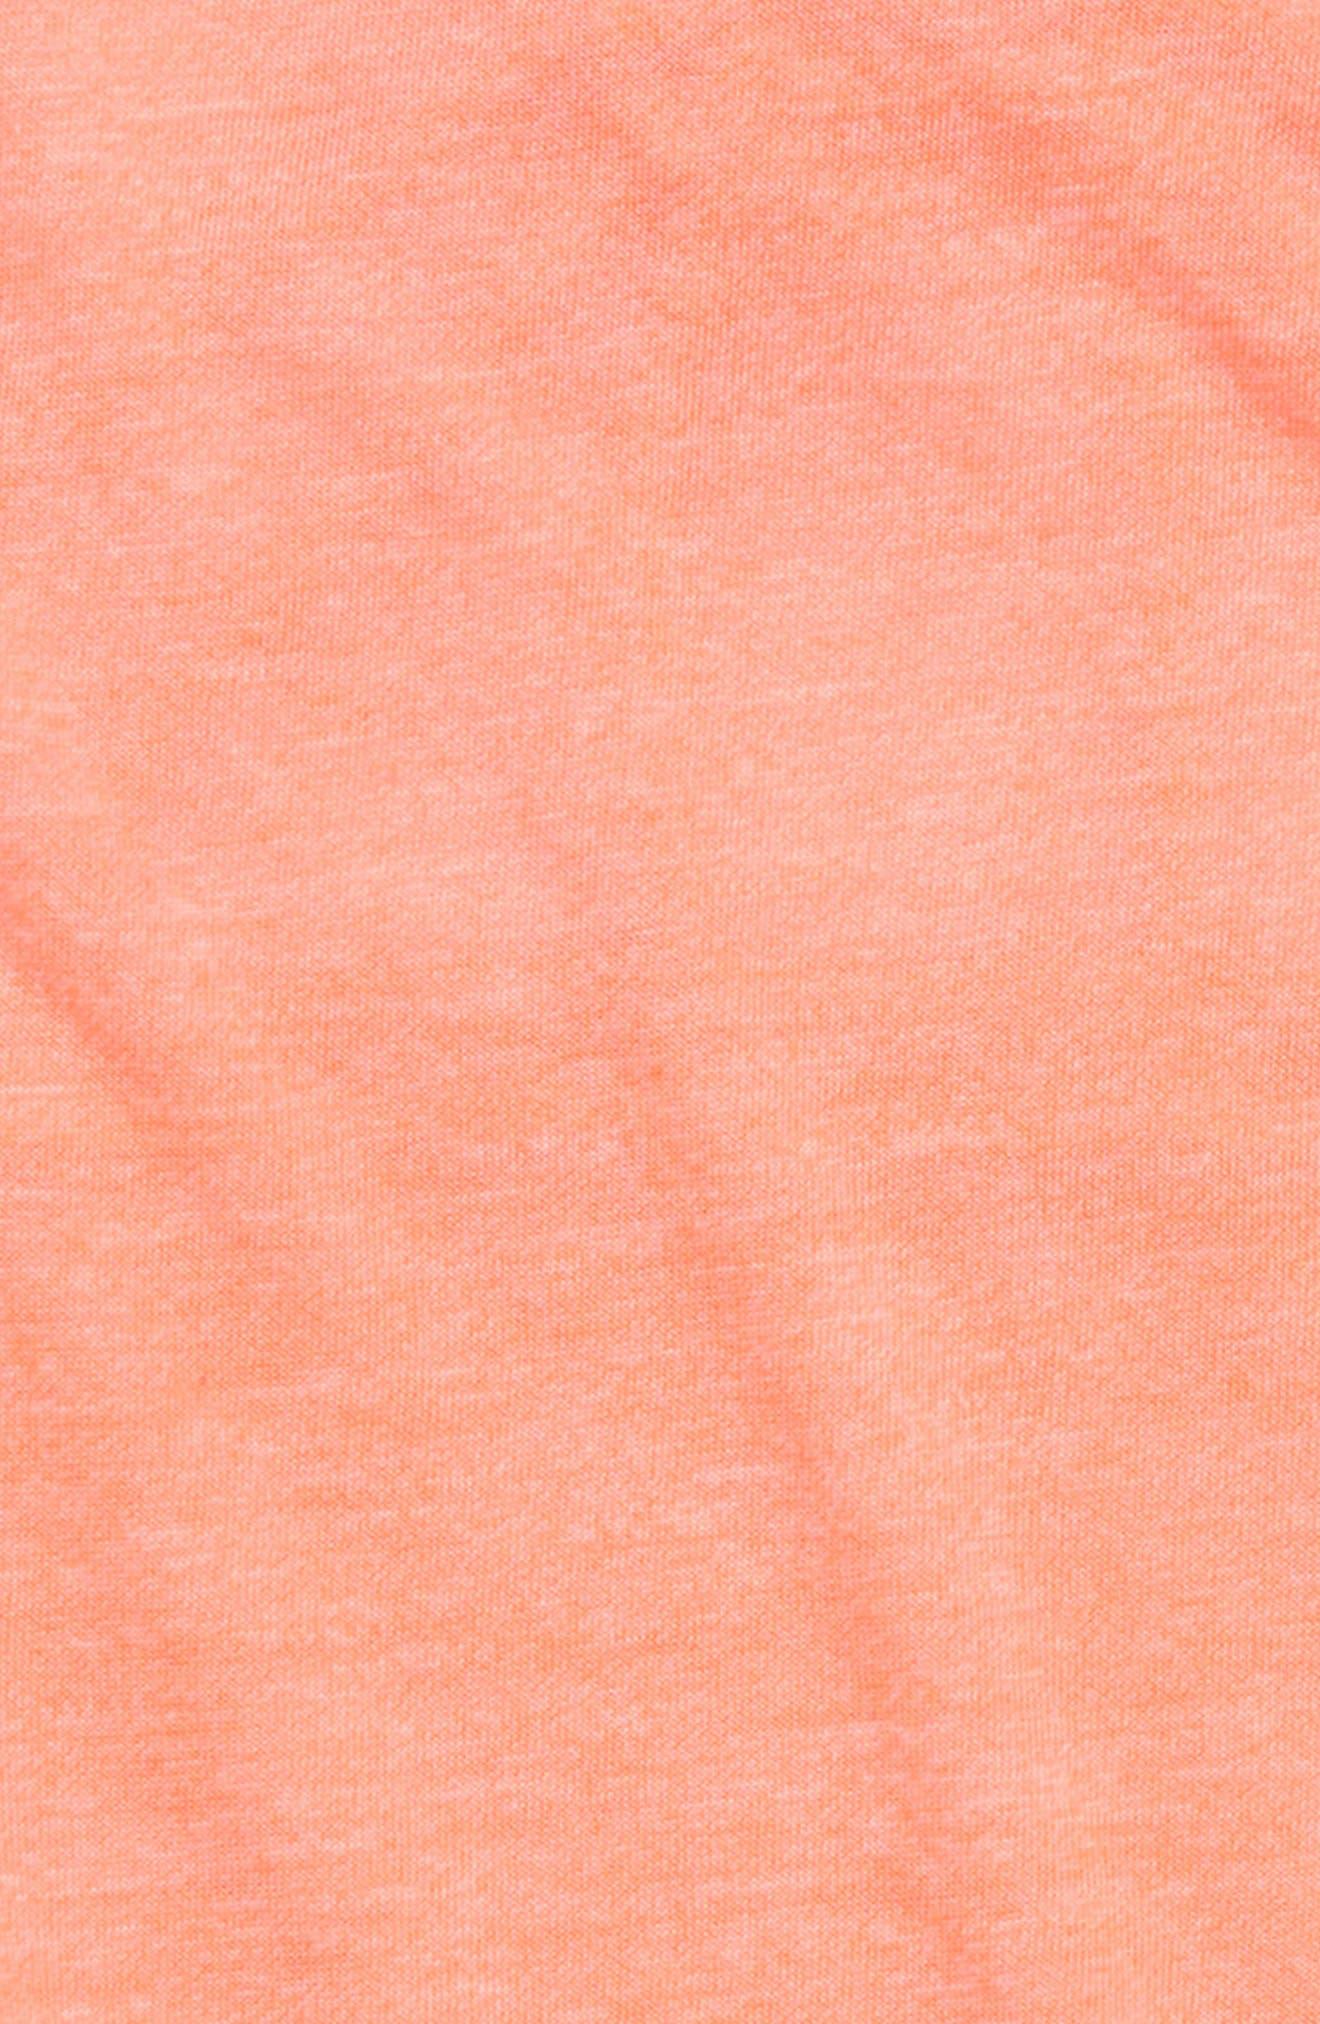 Macramé Back Tank,                             Alternate thumbnail 3, color,                             Coral Sunlight